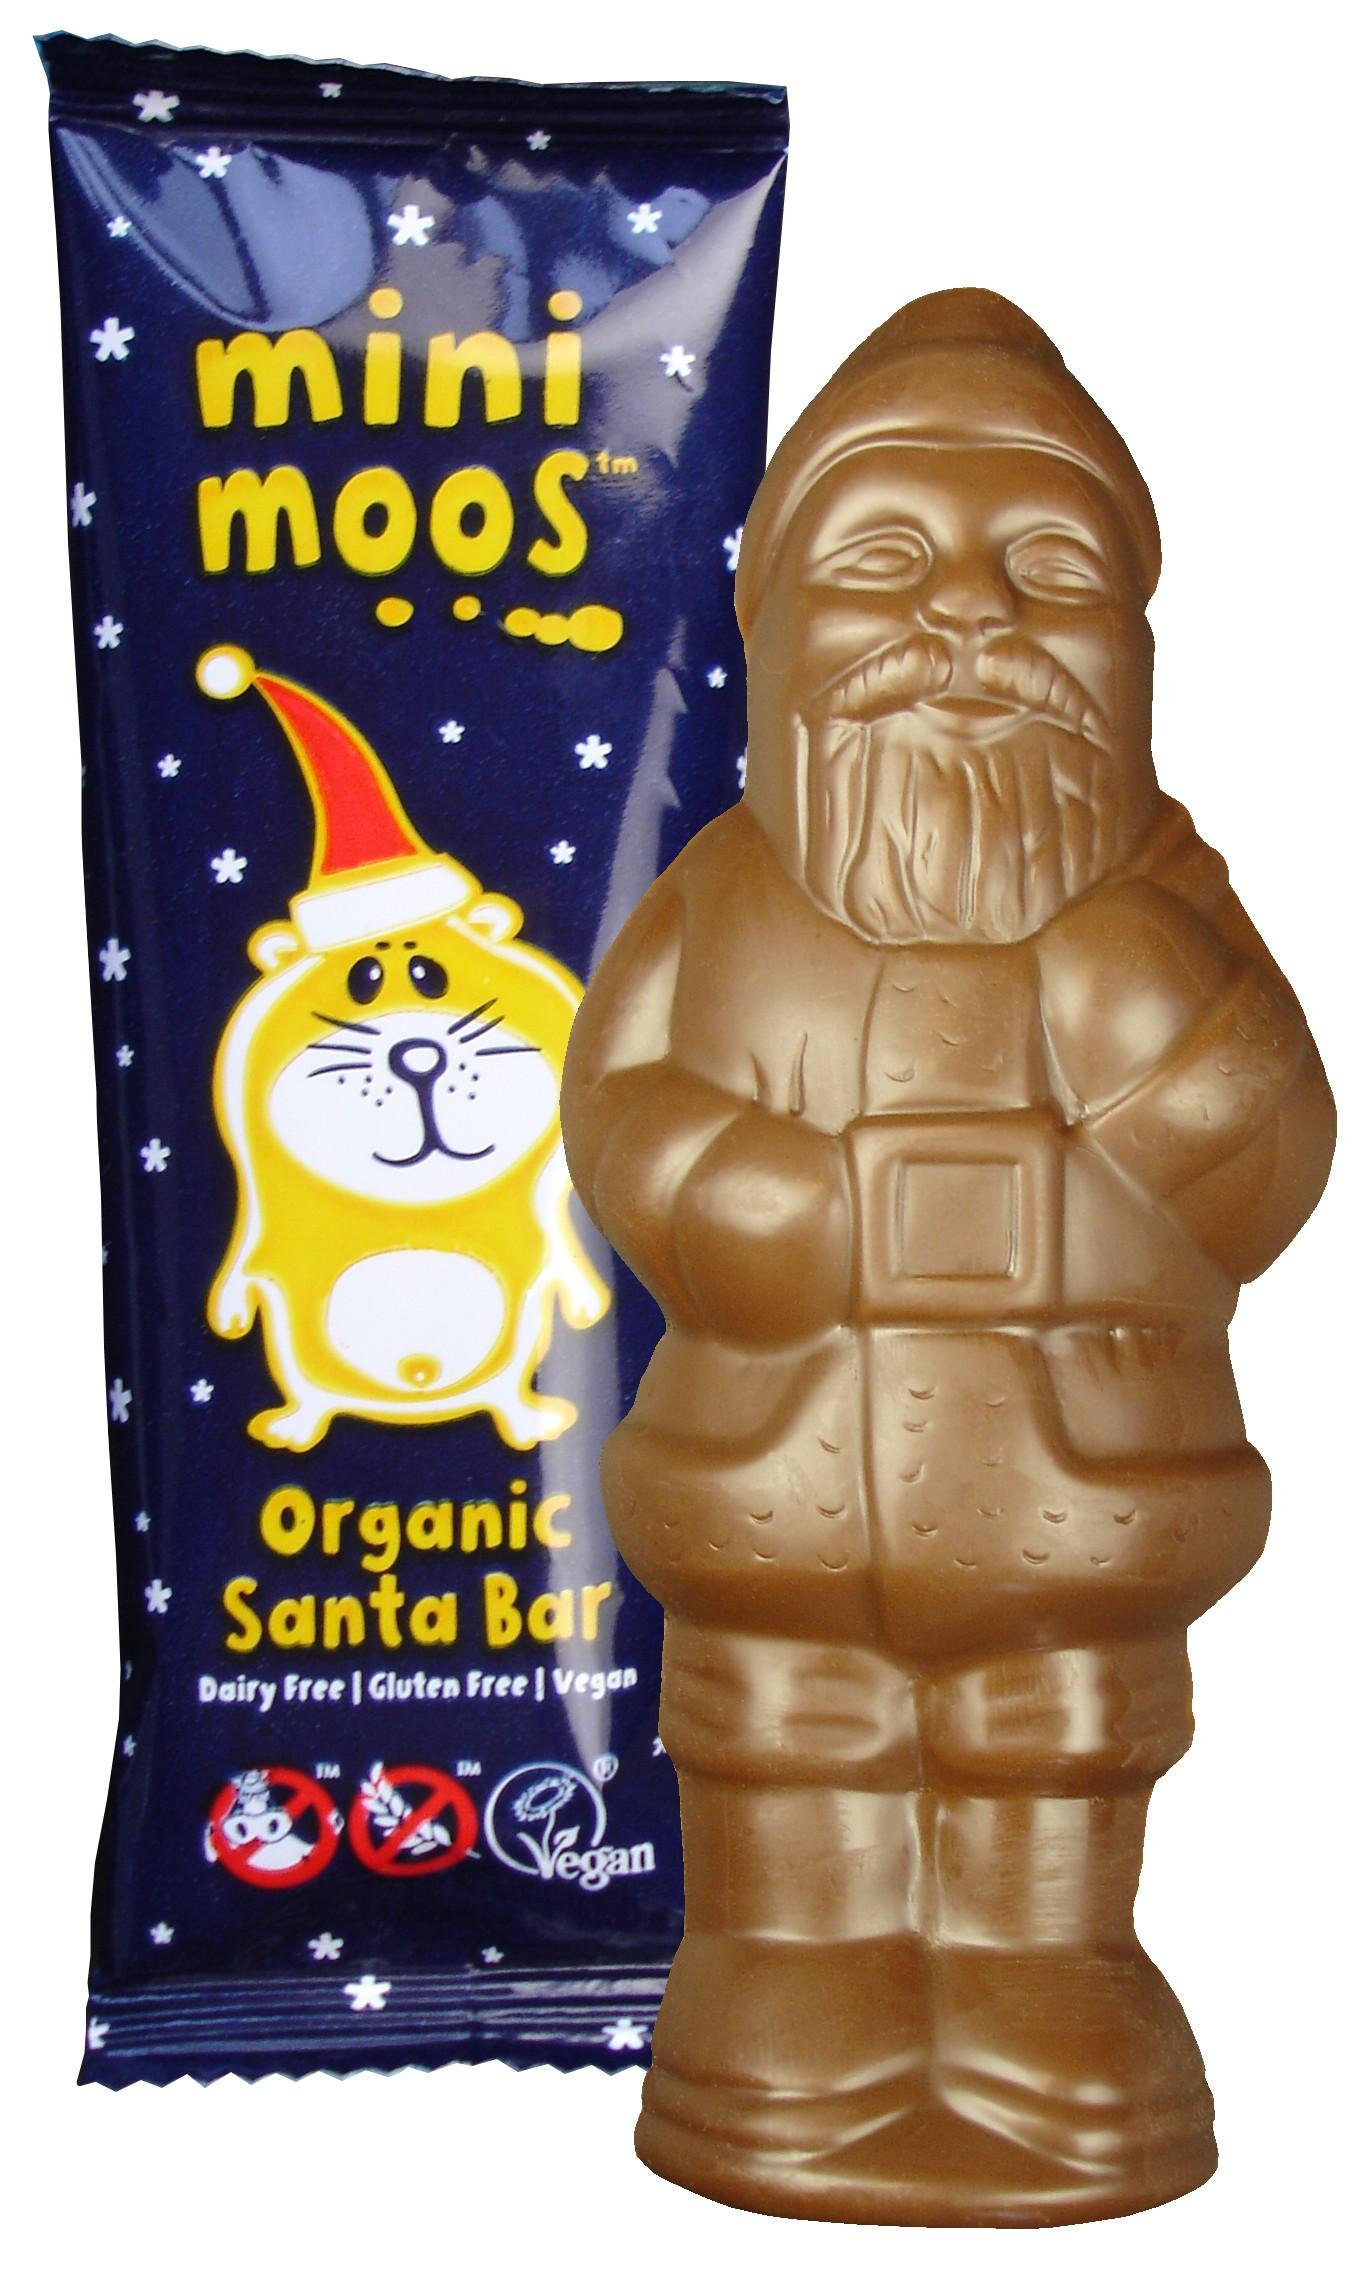 moo-free-santa-with-chocolate-hi-res.jpg